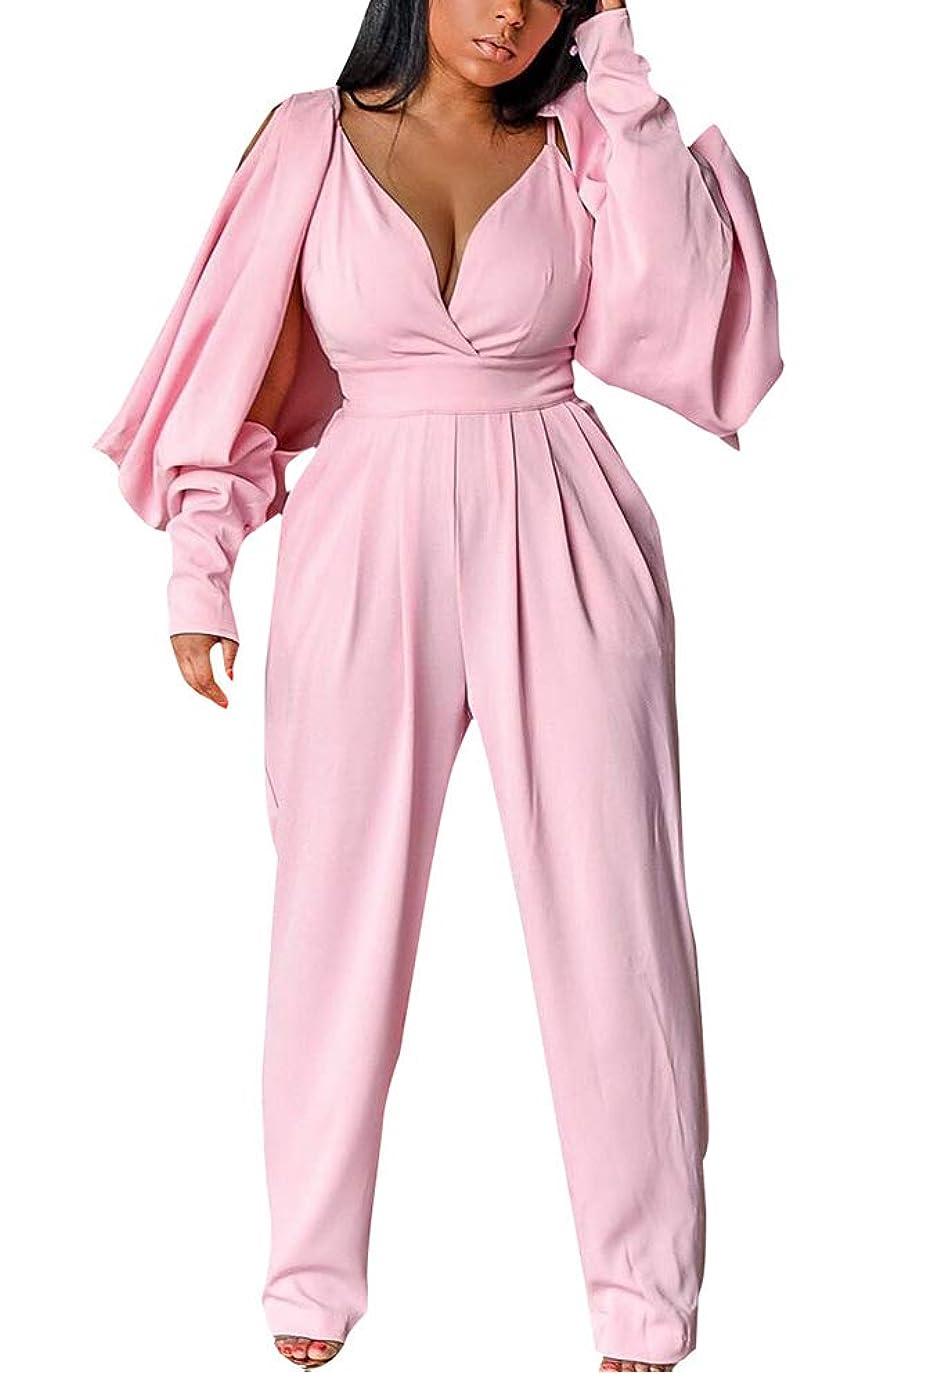 Womens Sexy Deep V Neck Split Long Sleeve Wide Leg Long Pants One Piece Jumpsuit Romper with Pockets Clubwear goi9132032